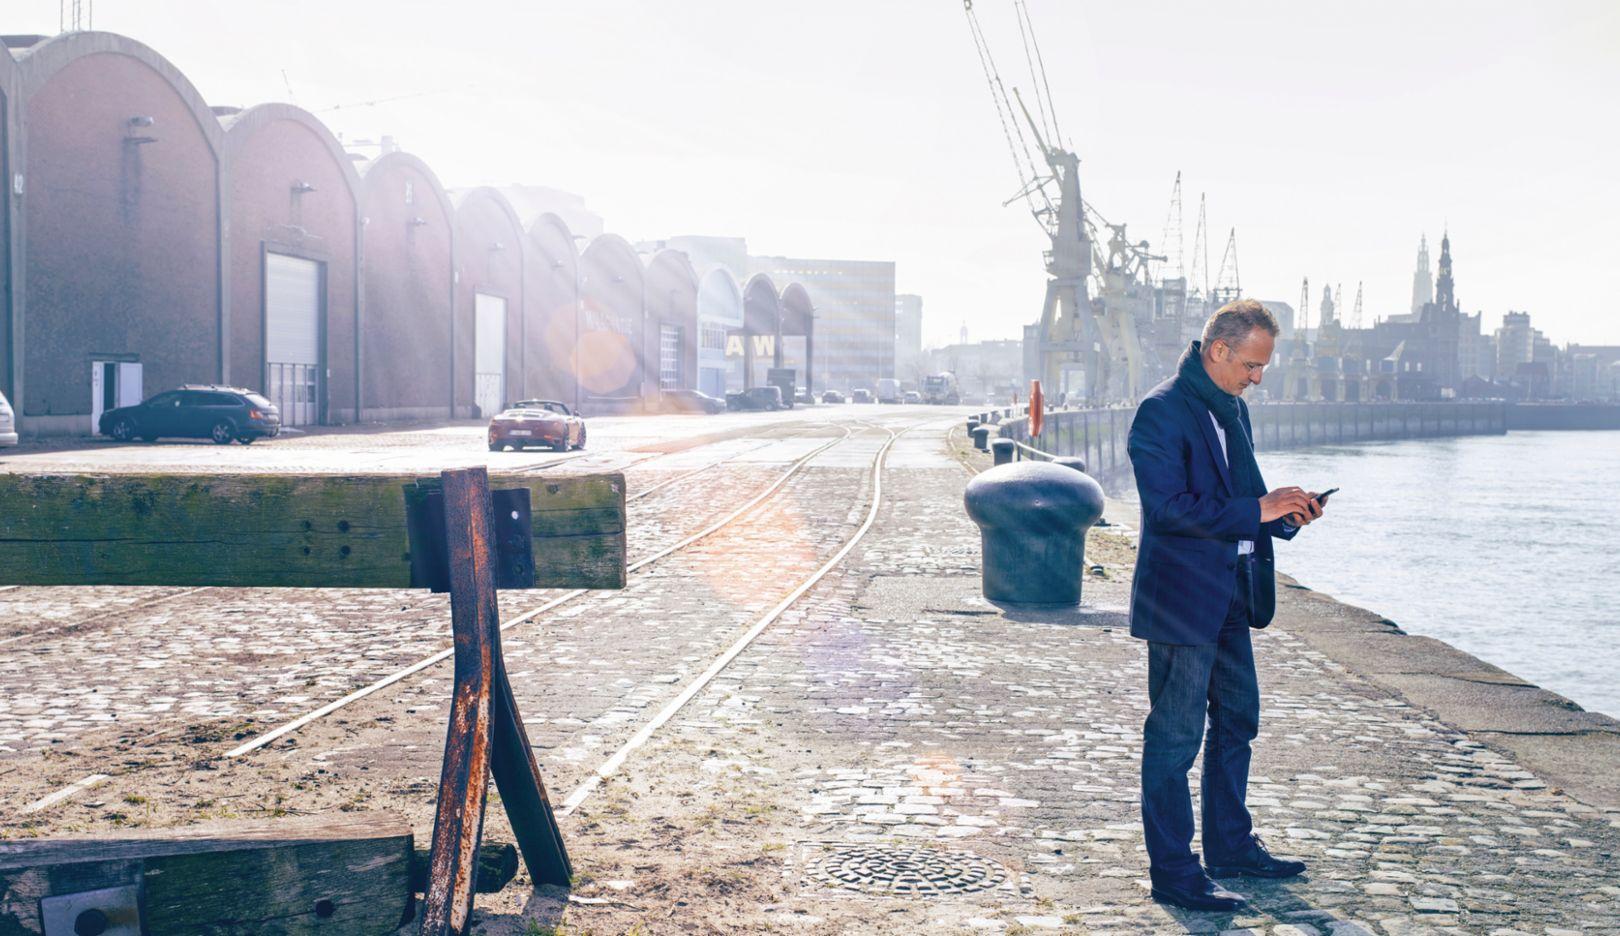 John Baekelmans, Antwerpen, 2016, Porsche AG